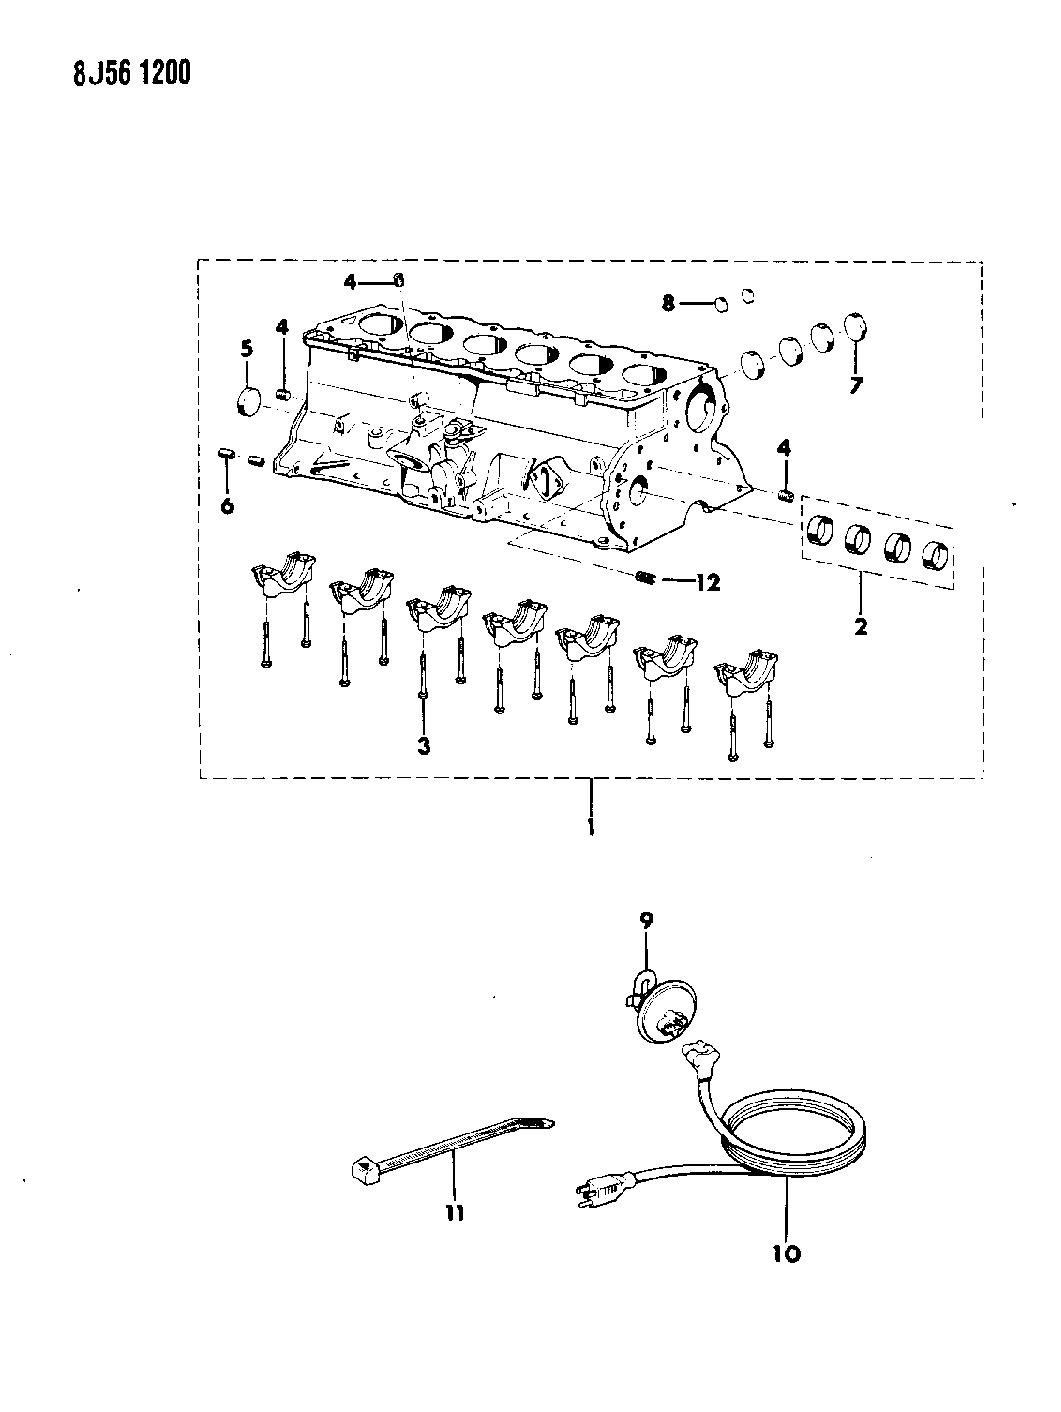 1987 Jeep Wrangler Cylinder Block Mopar Parts Giant Yj Engine Diagram Thumbnail 2